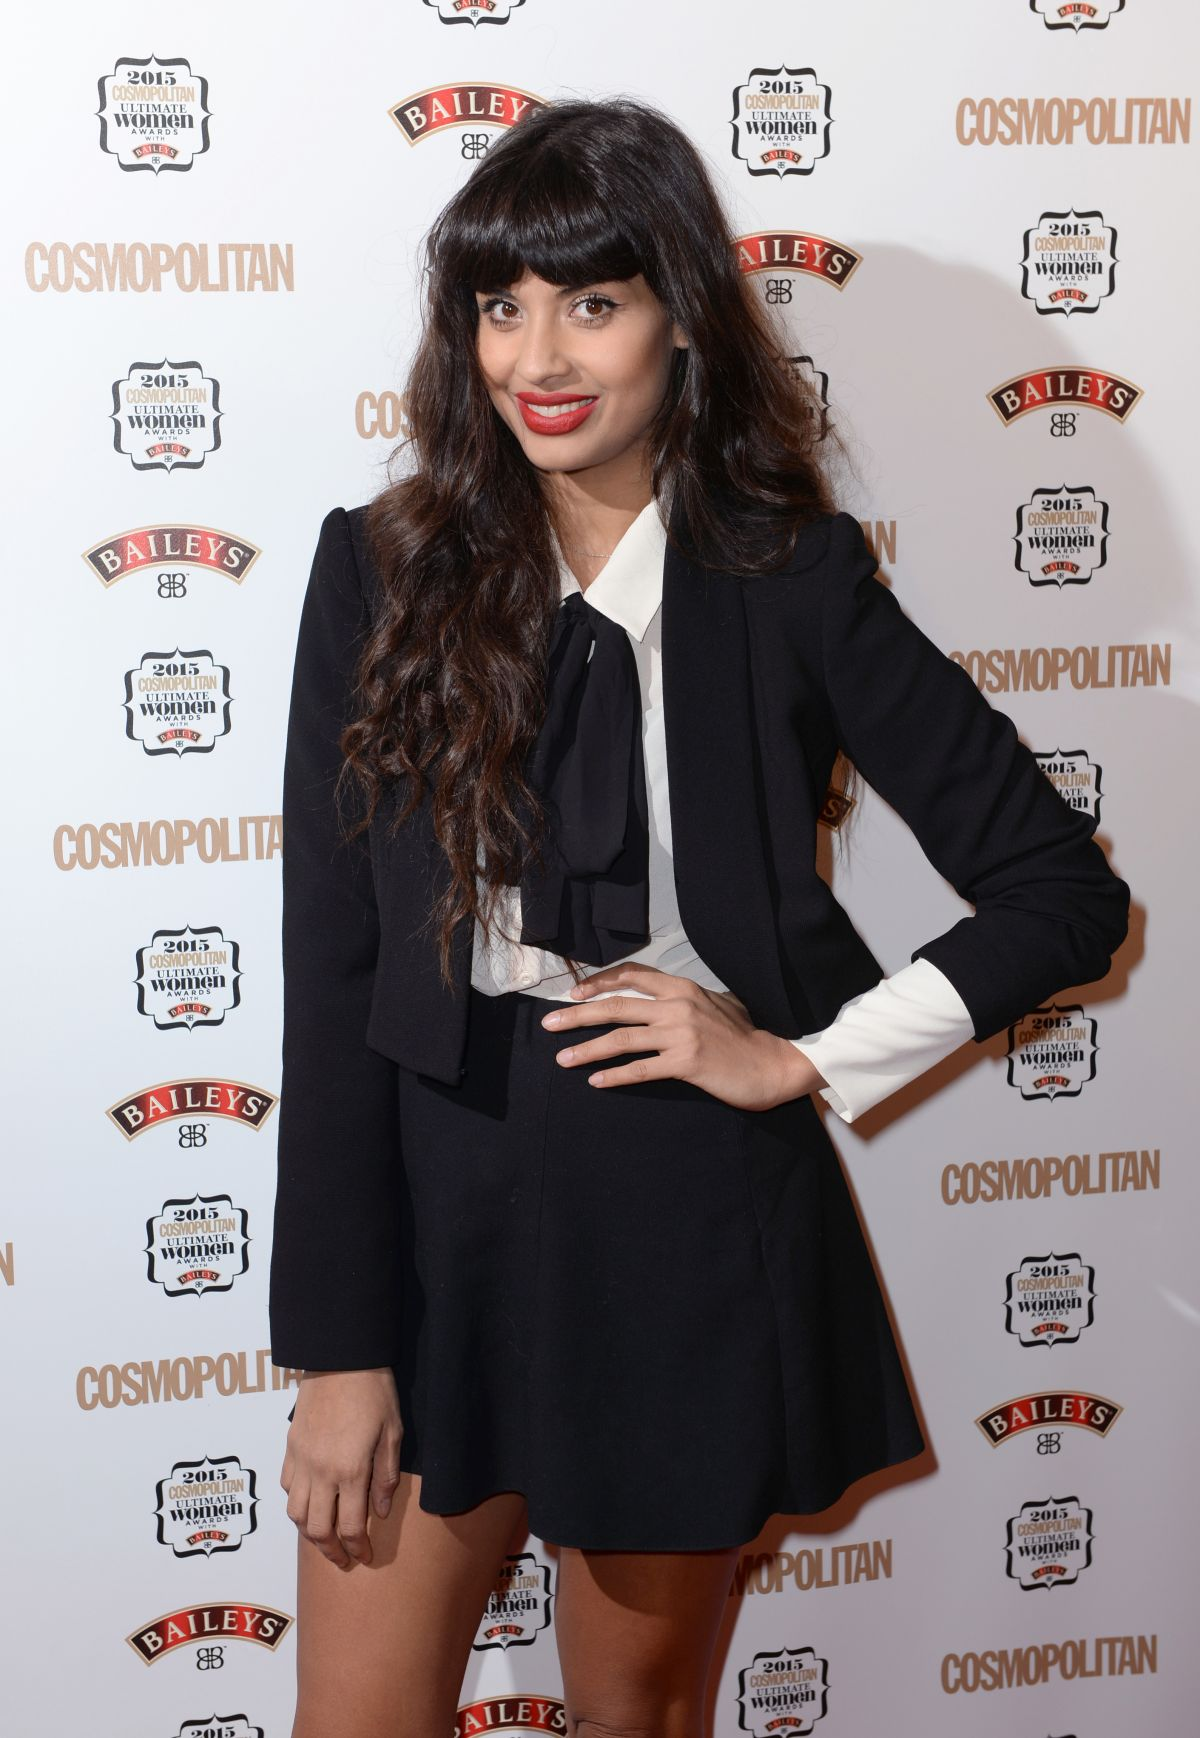 Alesha dixon pictures cosmopolitan ultimate women of the year awards - Jameela Jamil At Cosmopolitan Ultimate Women Of The Year Awards In London 12 03